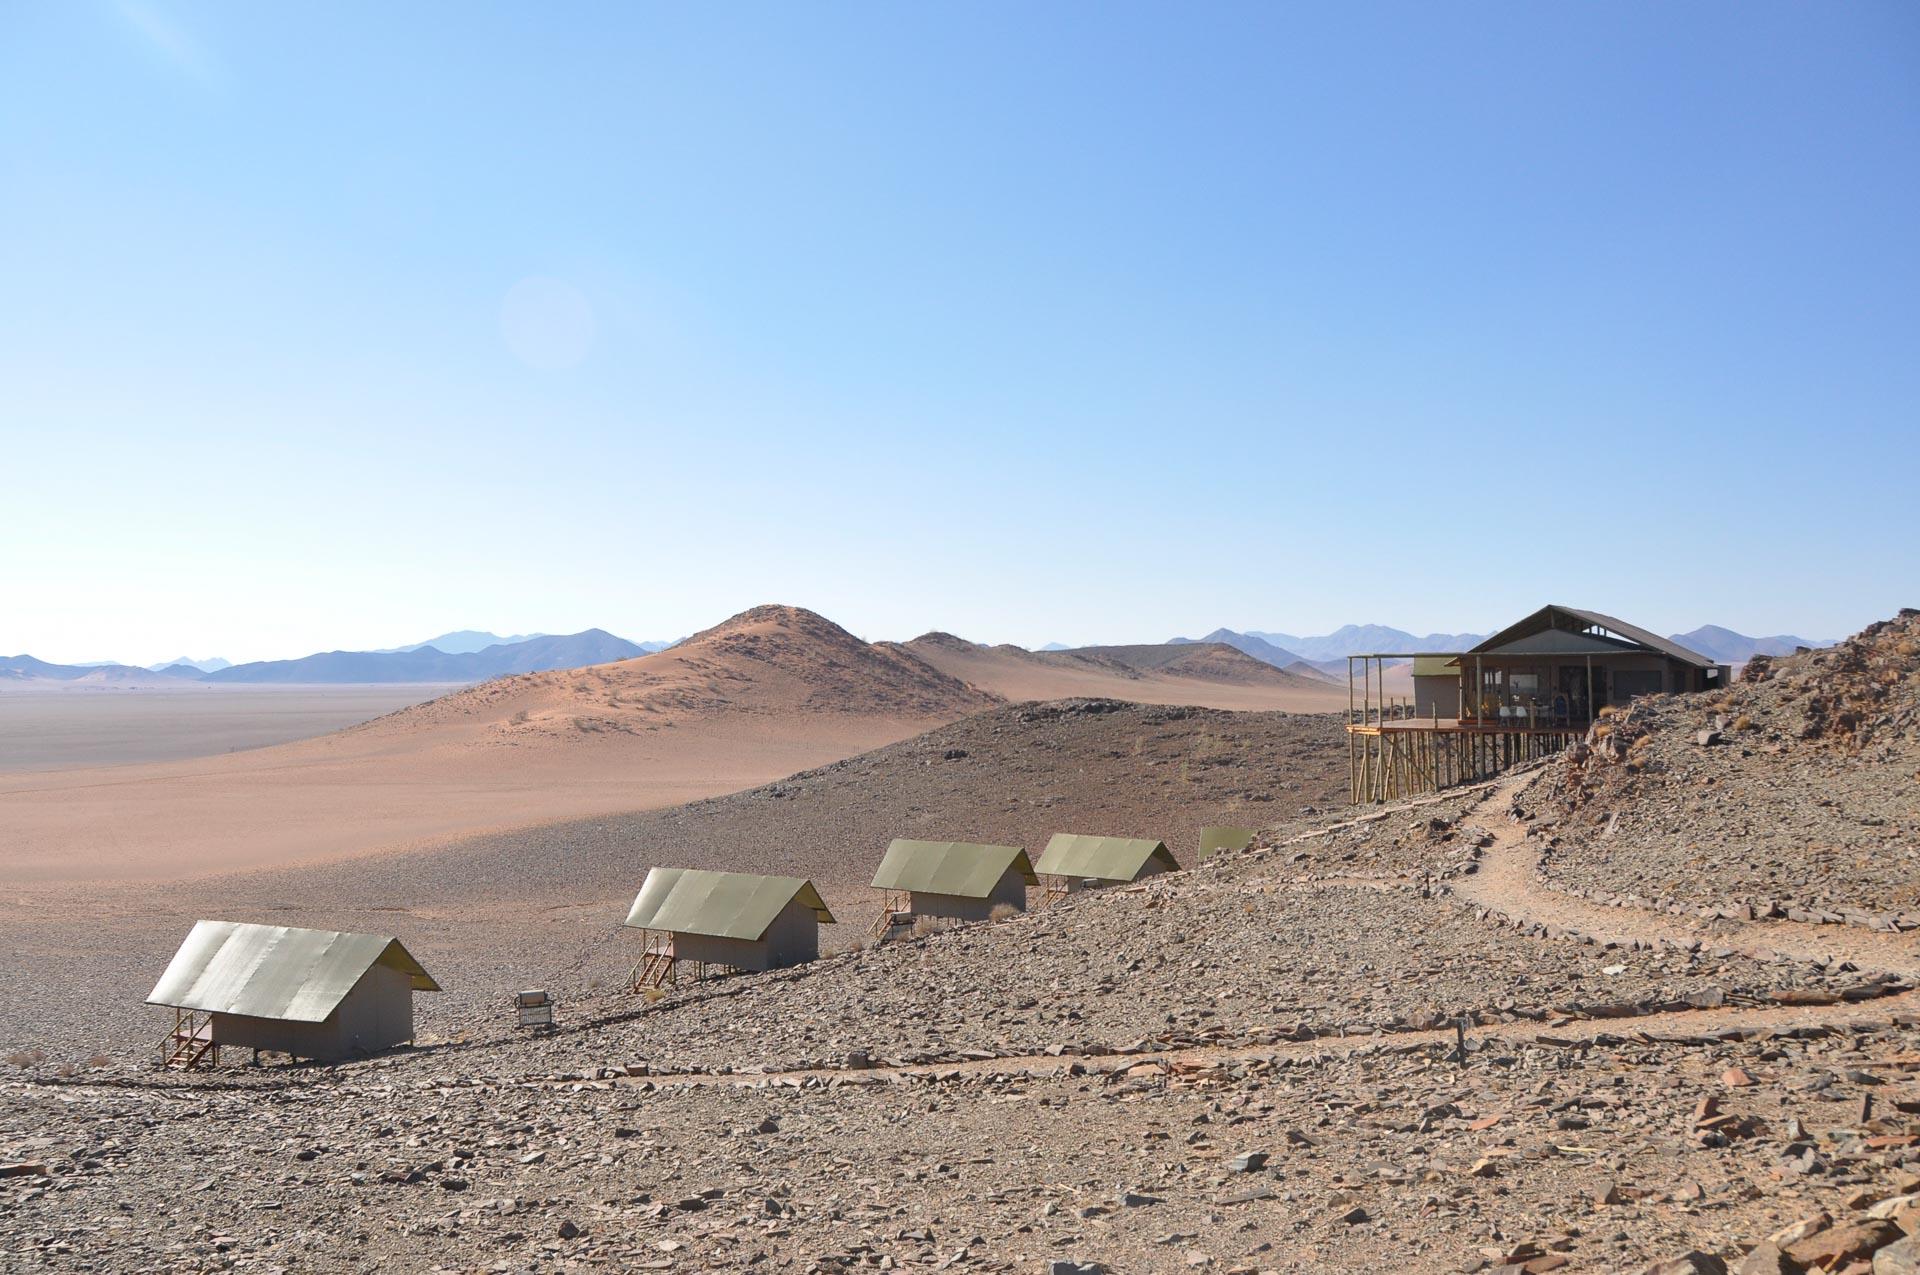 Kanaan-Desert-Retreat-Namibia-Globetrotter-Select-5